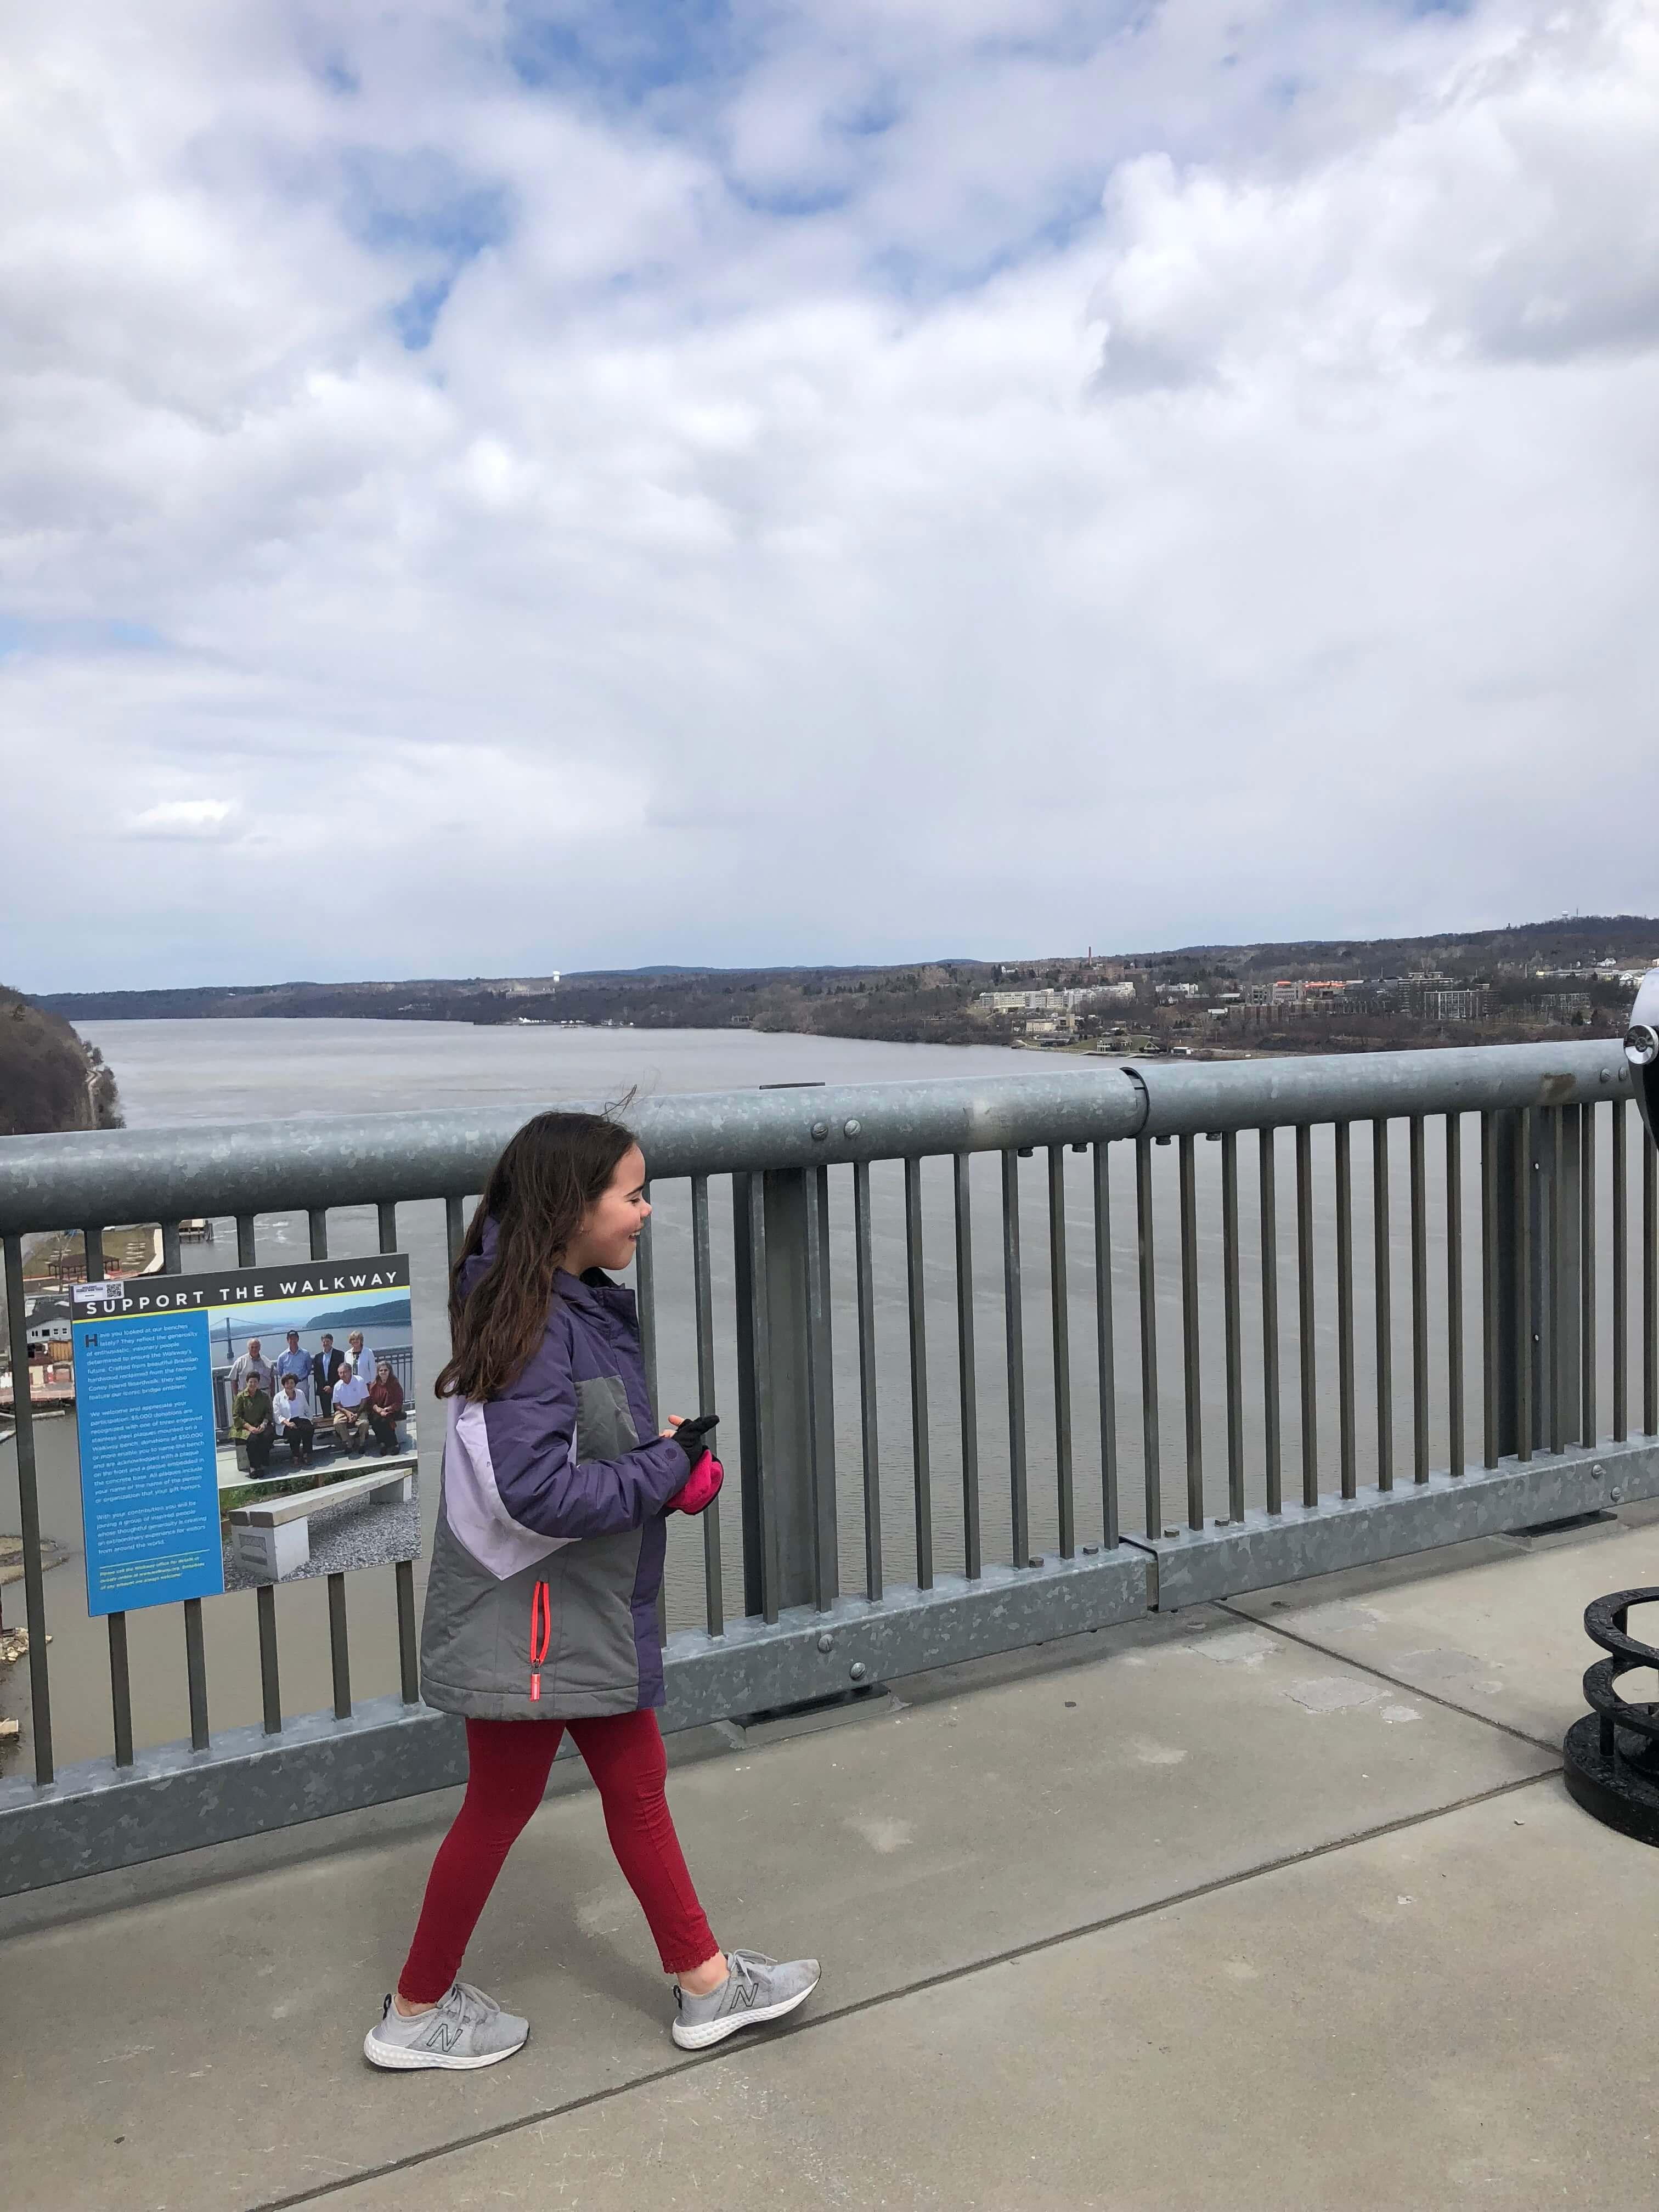 Walkway Over the Hudson dutchess county adventure